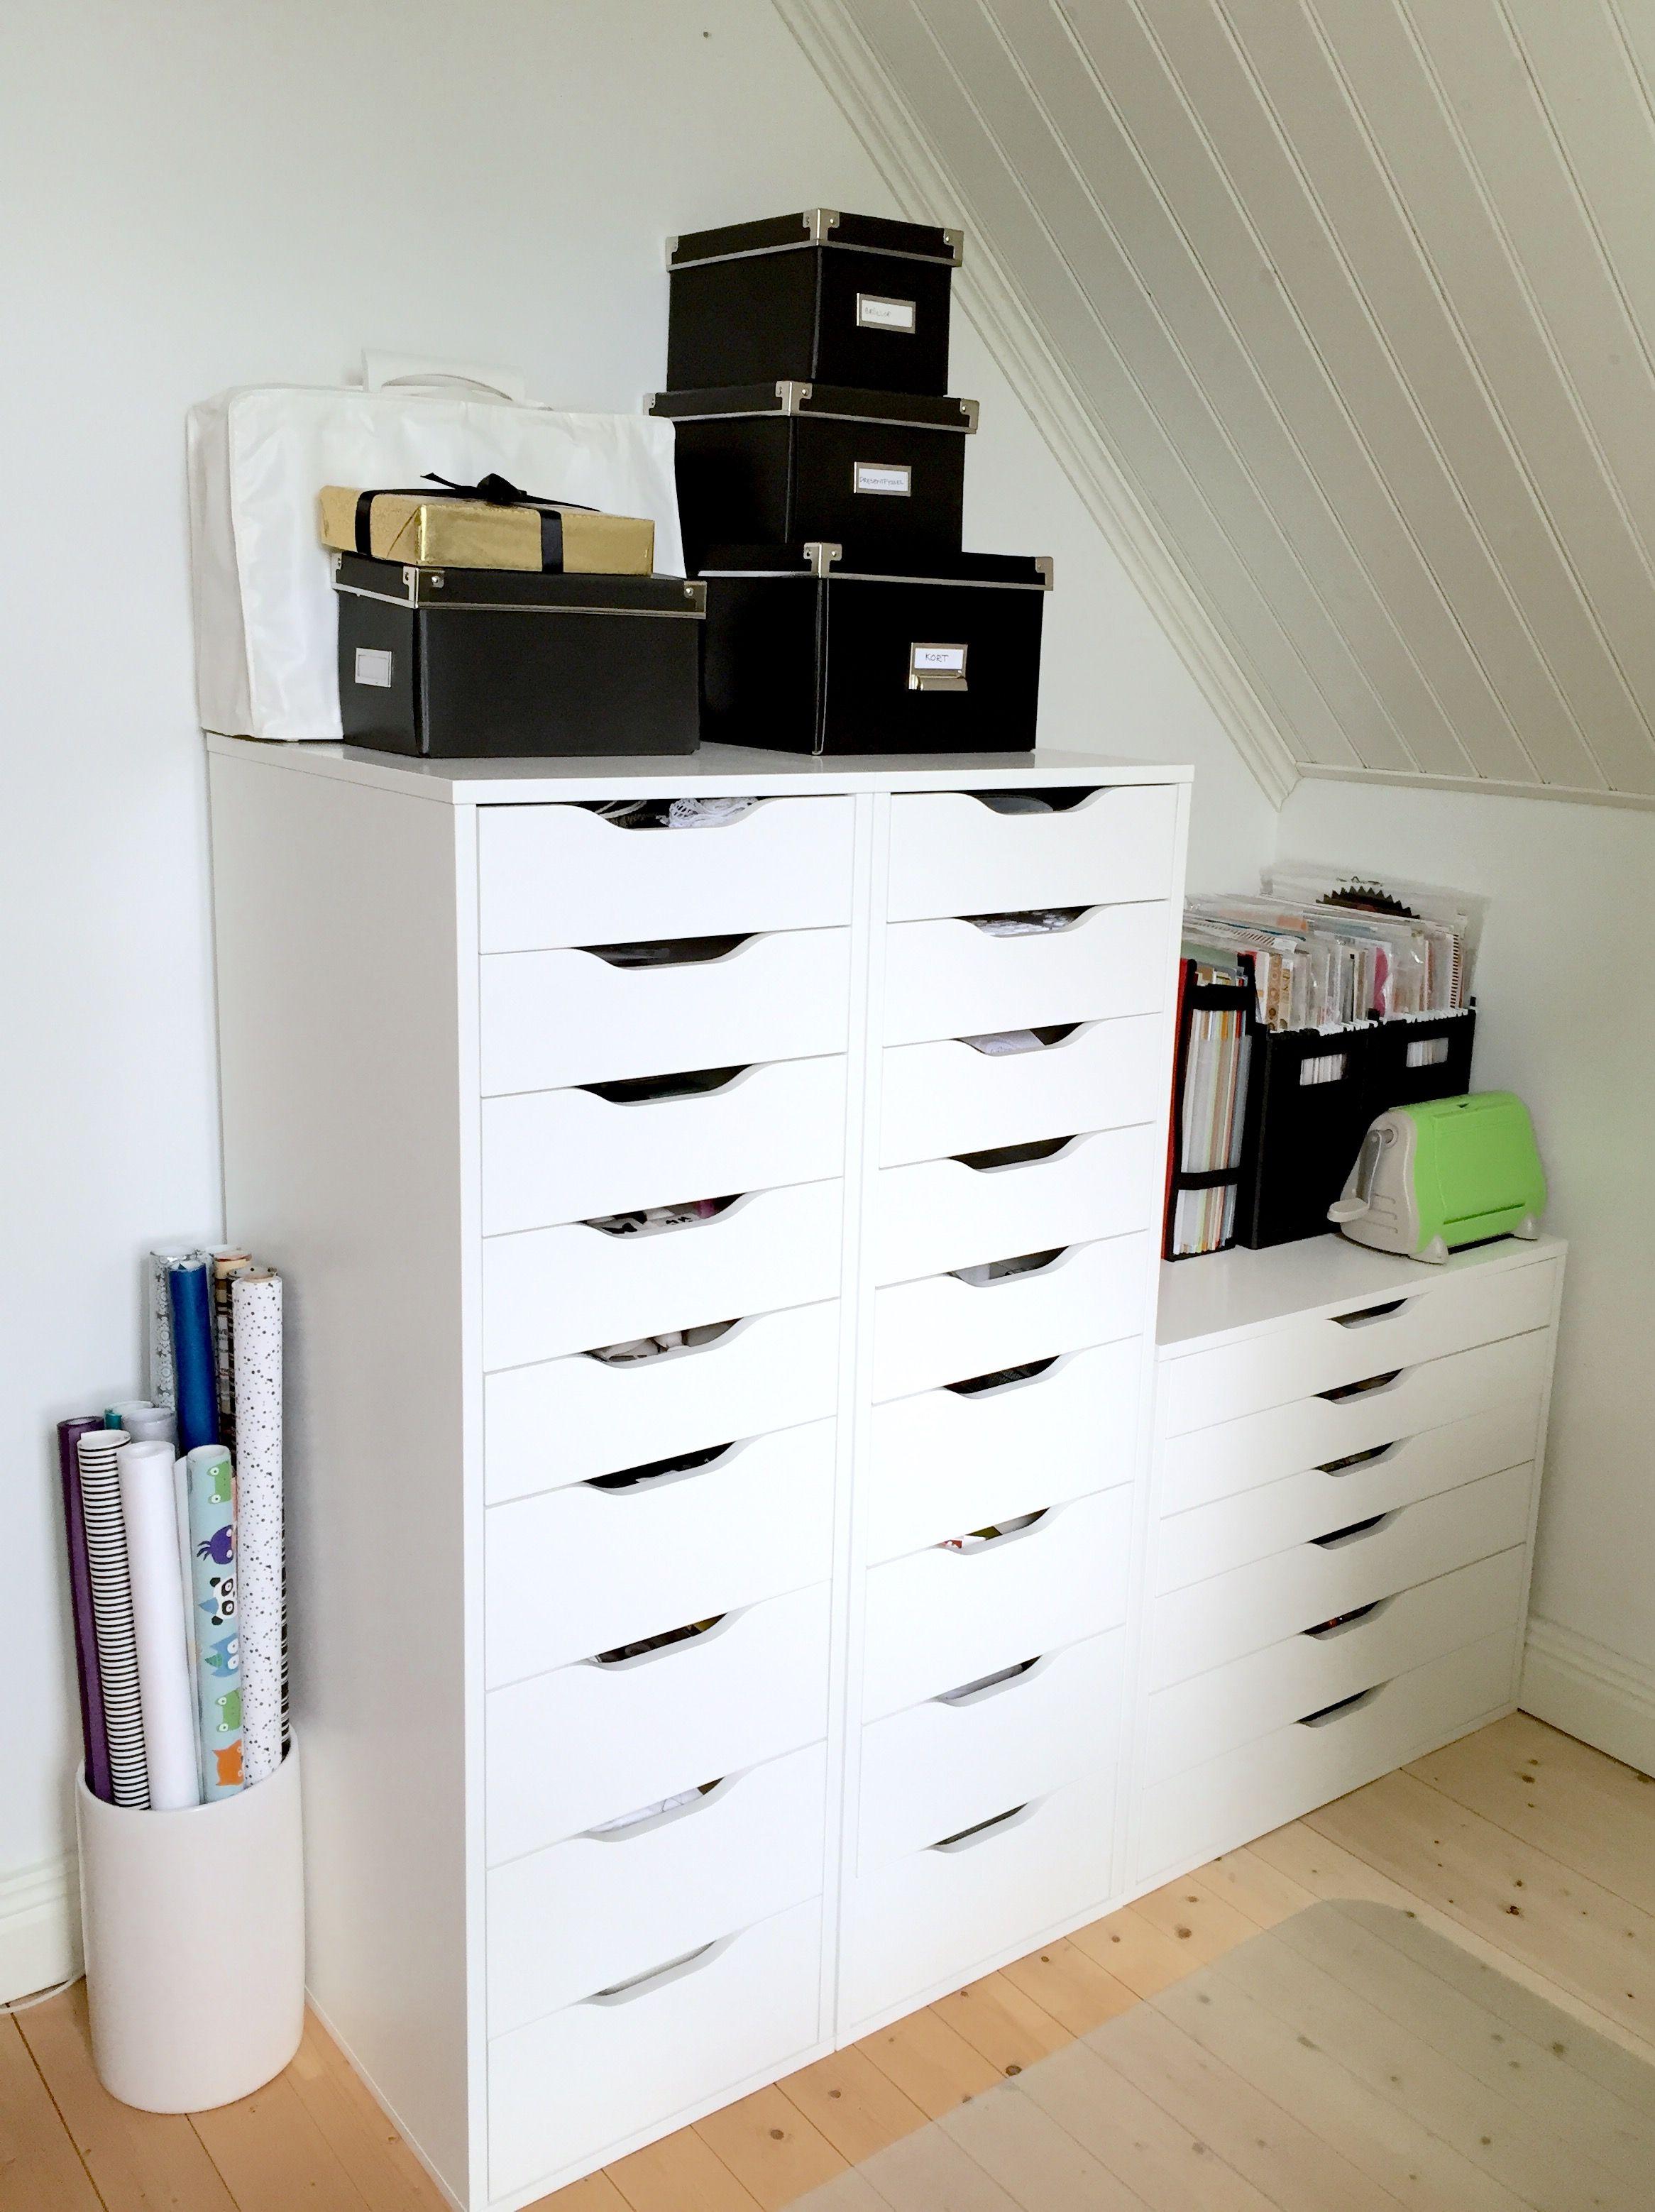 scrapbooking storage ikea alex drawers arbetsrum pinterest ikea alex drawers alex. Black Bedroom Furniture Sets. Home Design Ideas